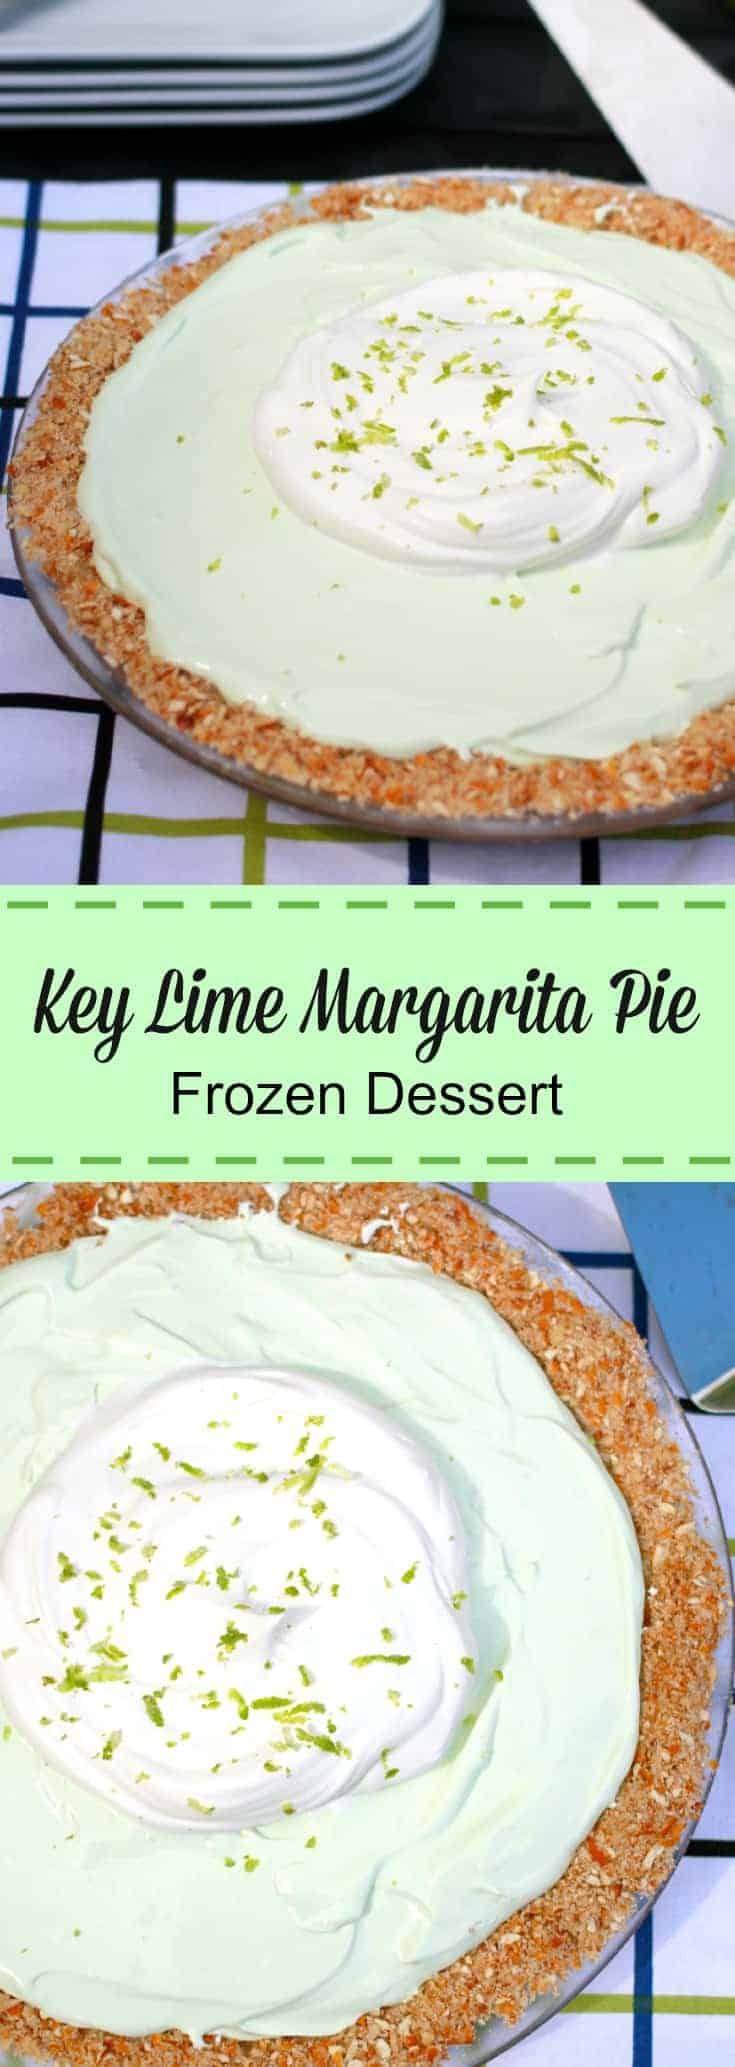 Key Lime Margarita Pie frozen dessert recipe